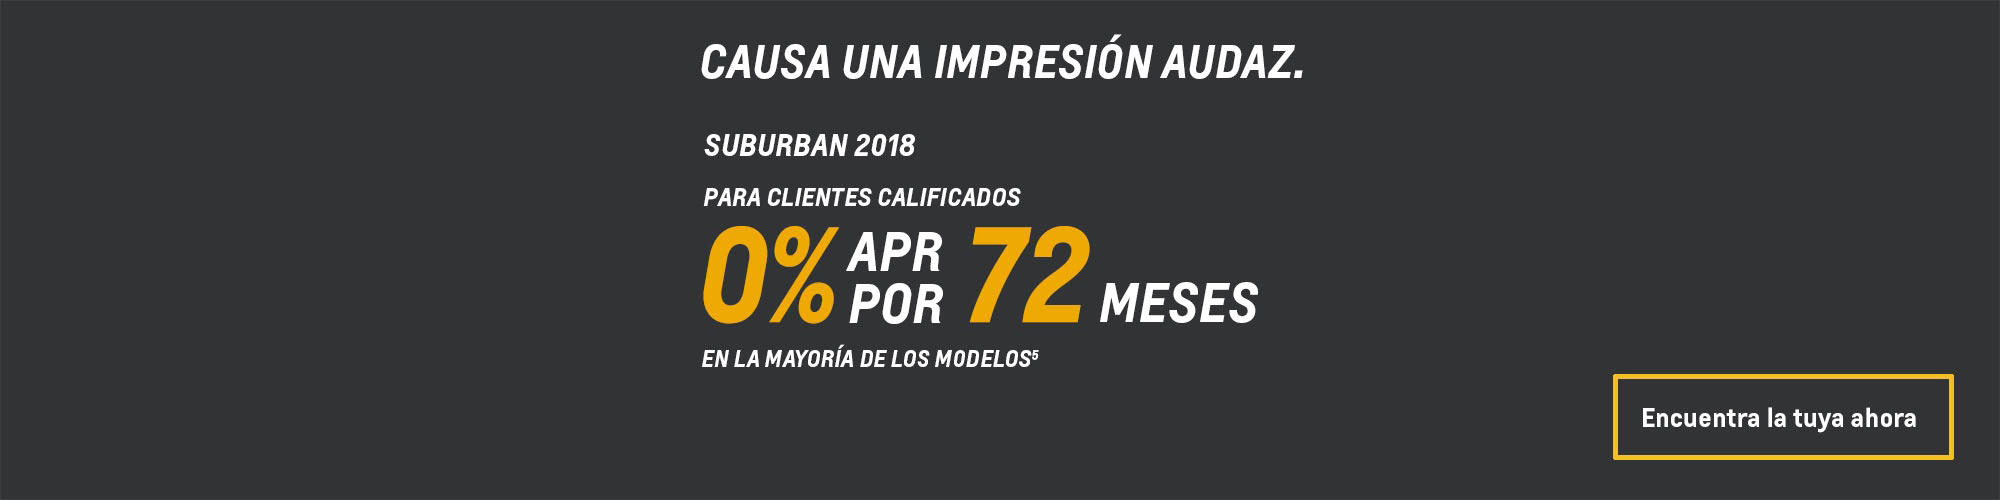 Suburban 2018: 0% APR por 72 meses